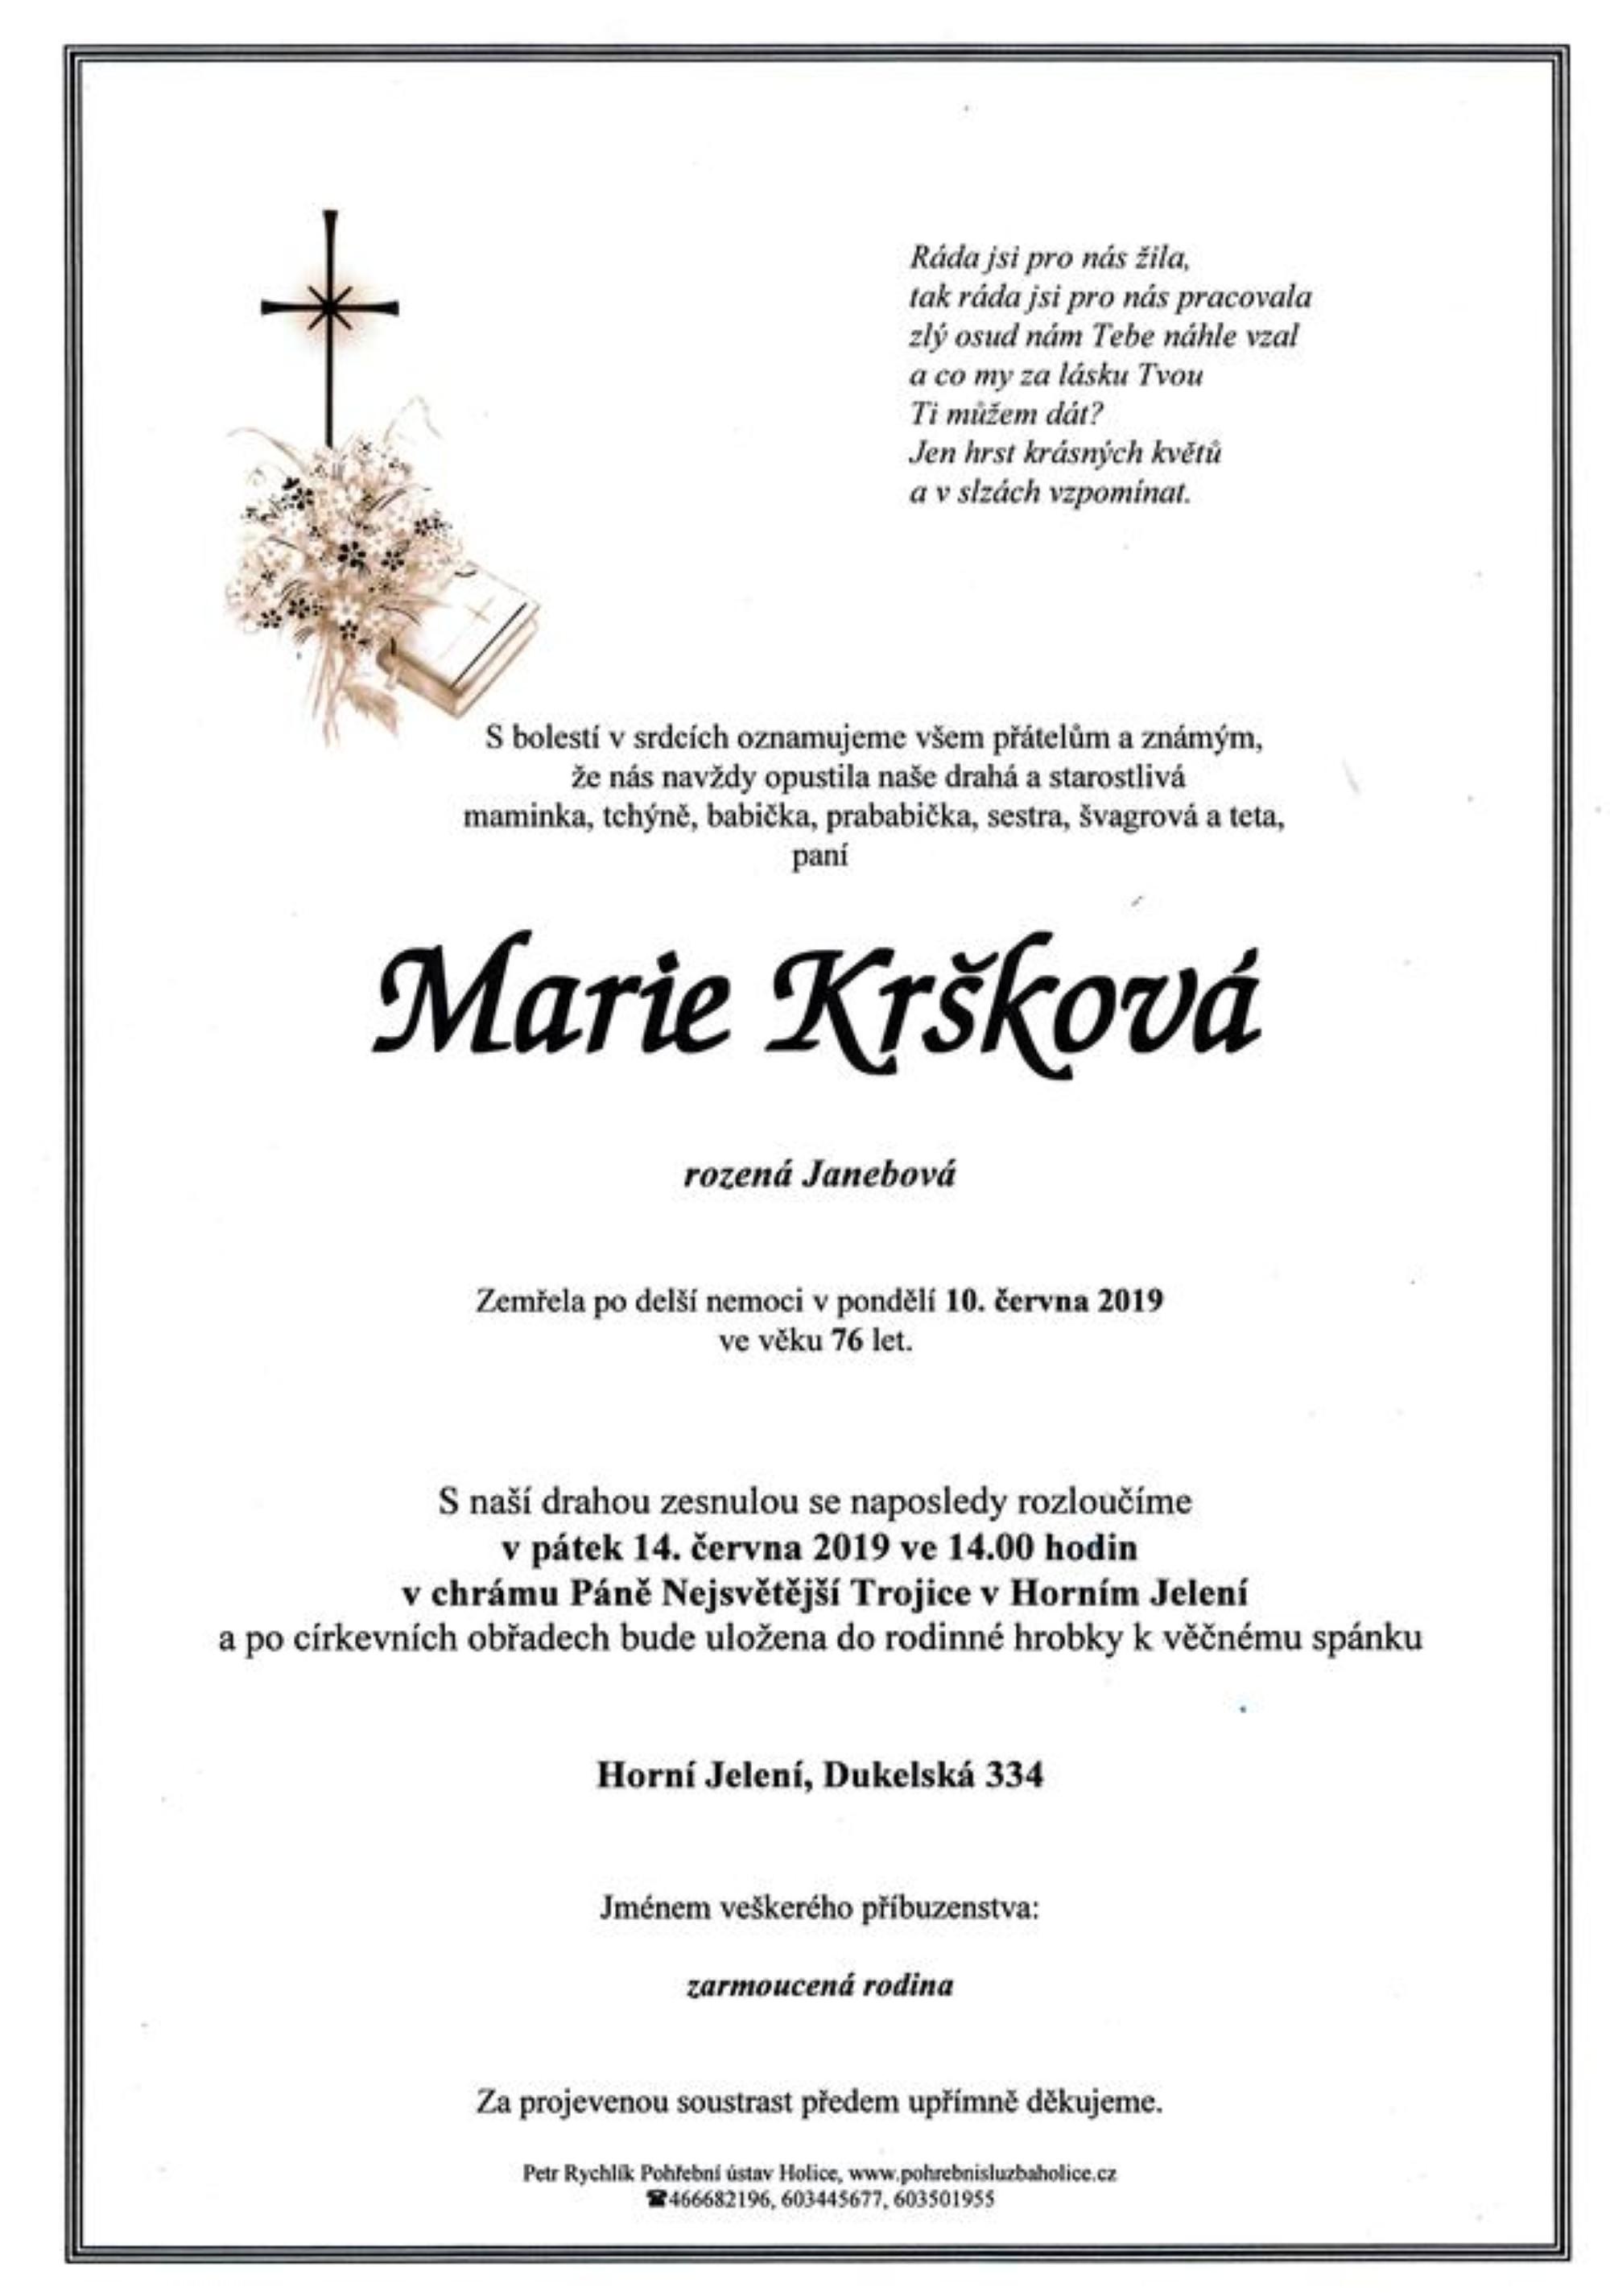 Marie Kršková